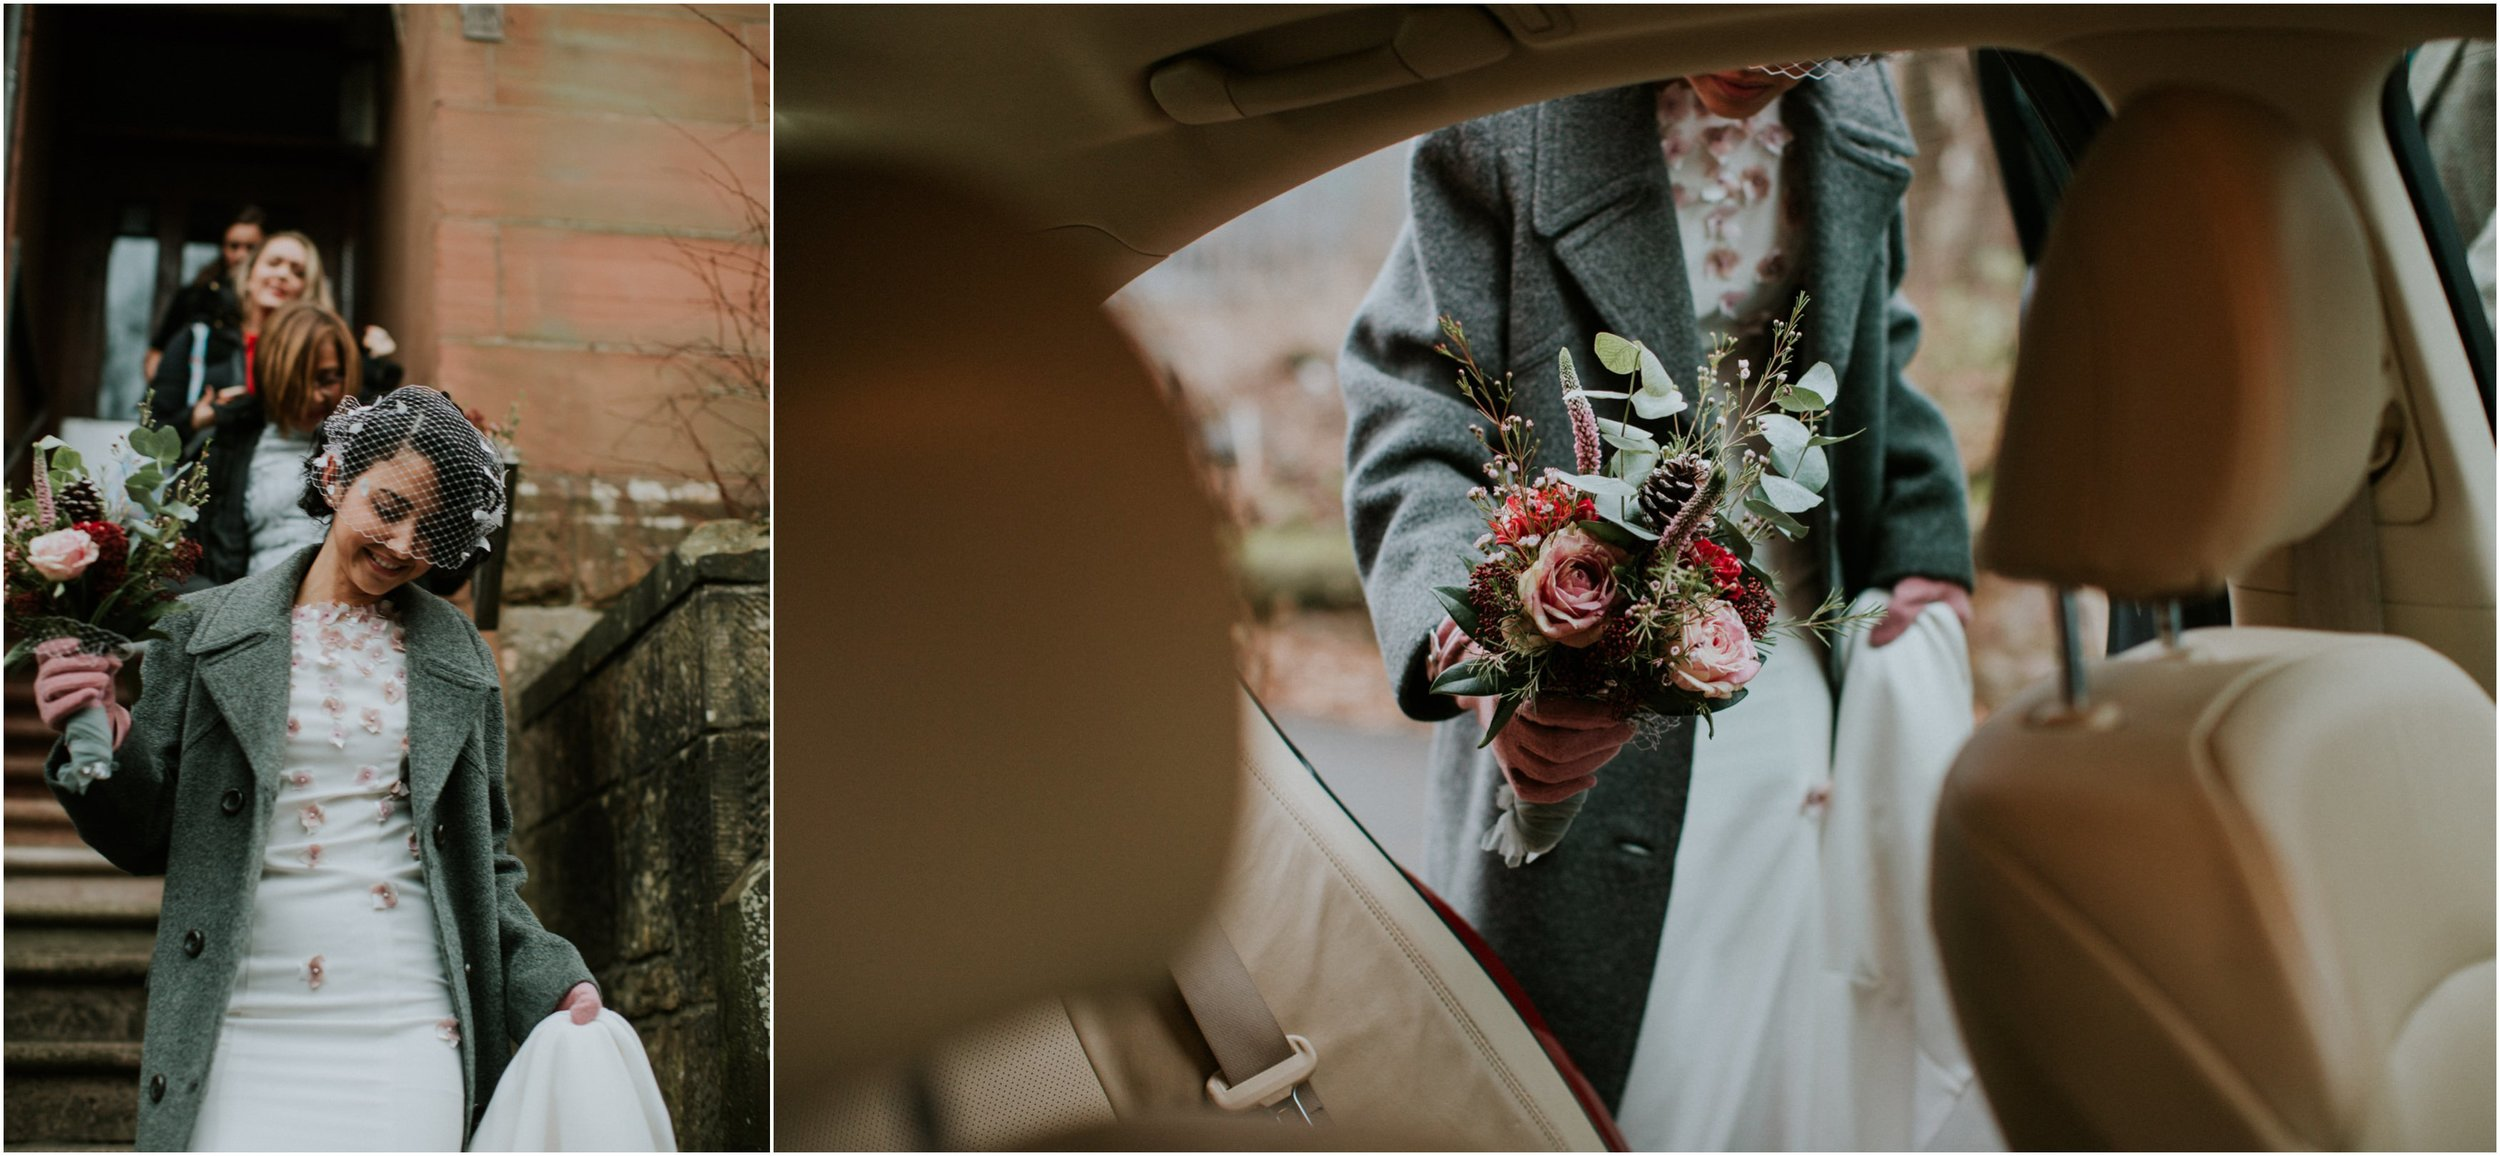 Photography 78 - Glasgow Wedding Photographer - Mike & Karol - Ubiquitous Chip Ashton Lane_0020.jpg